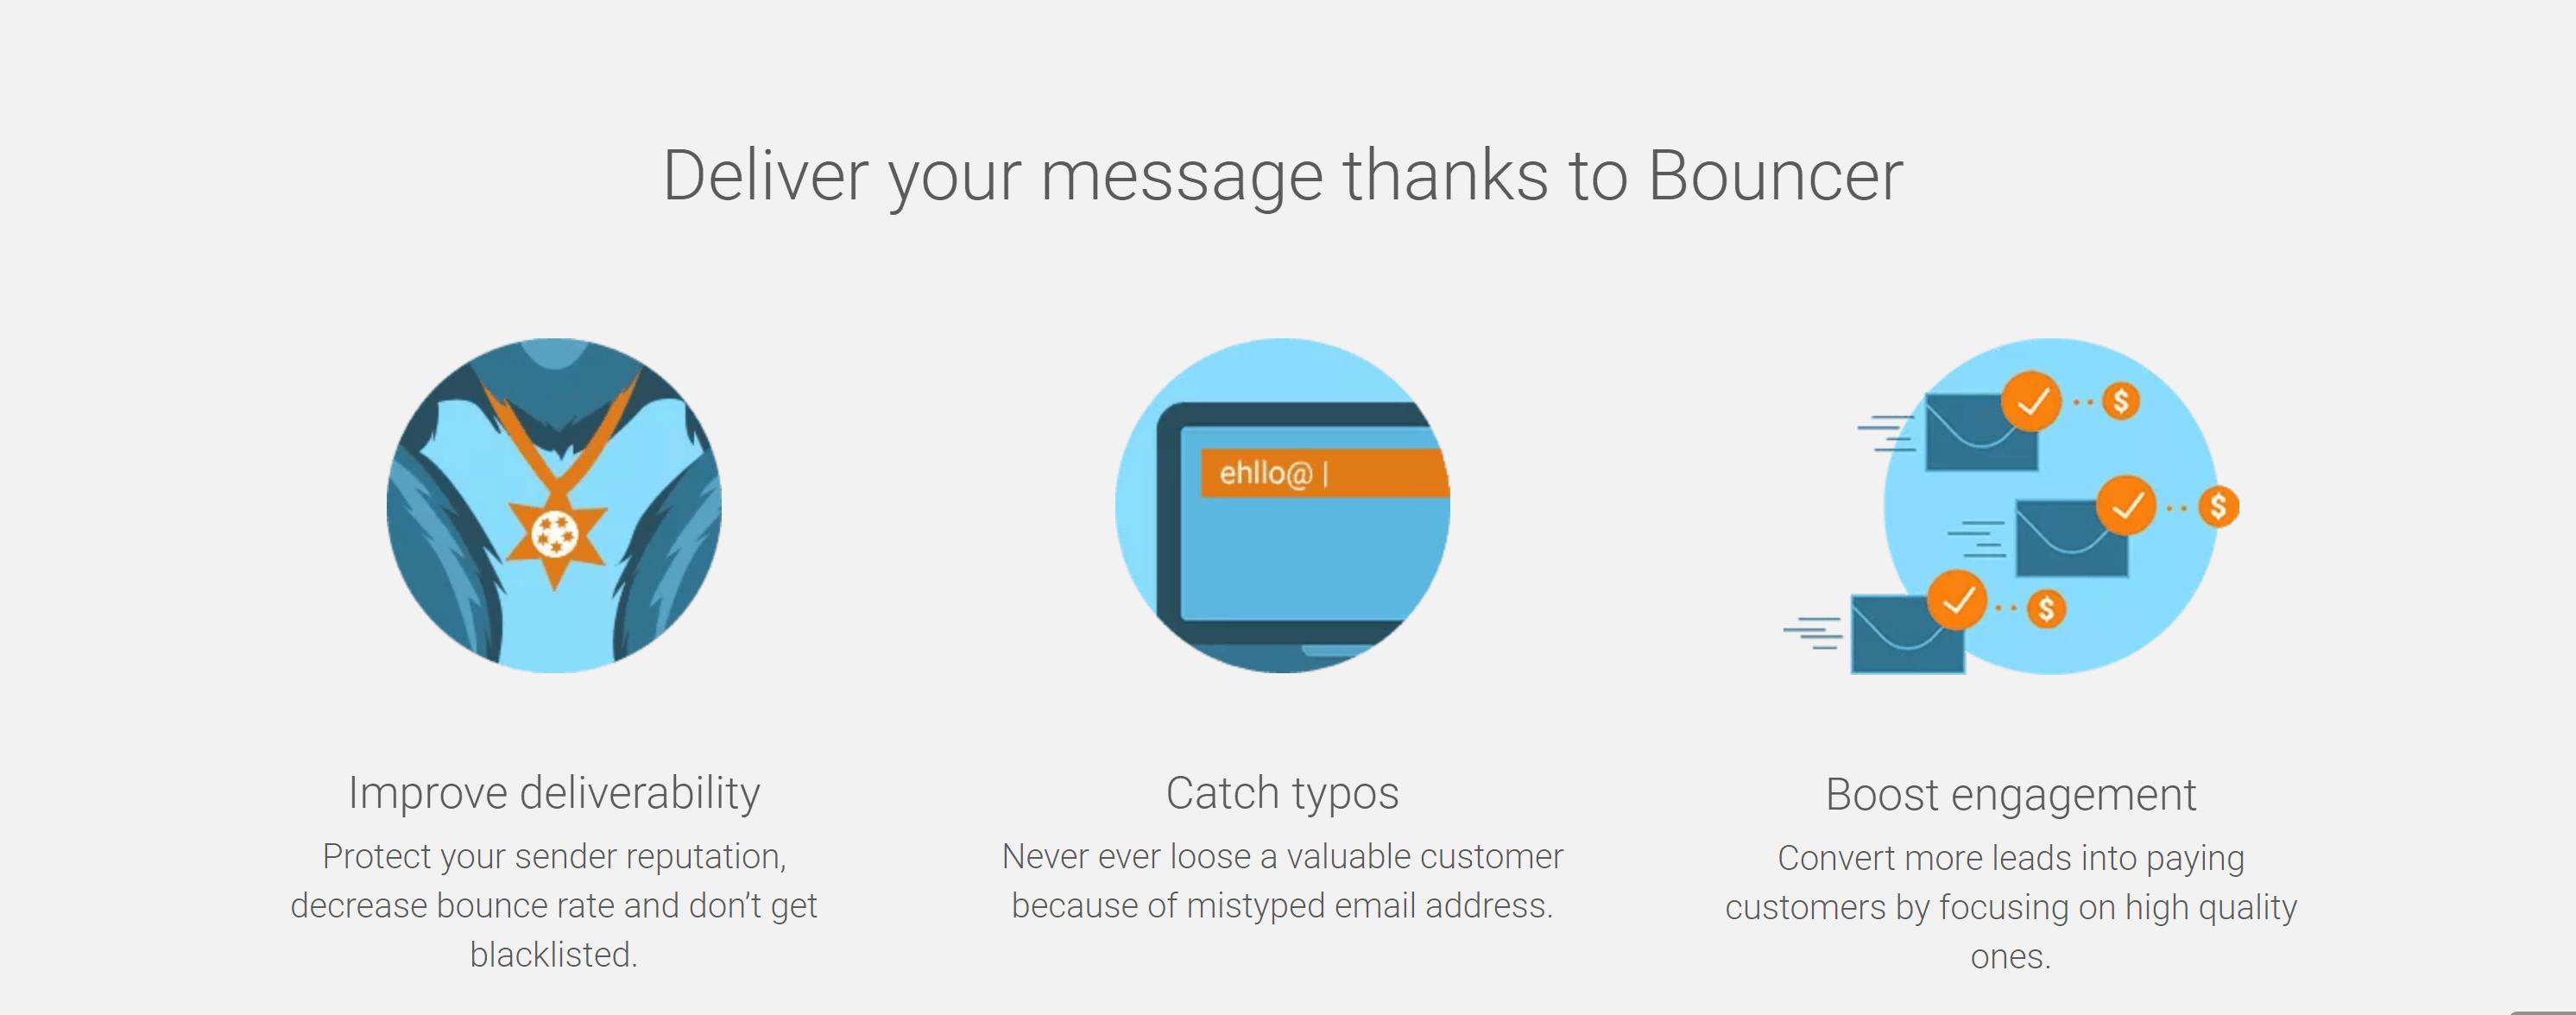 Bouncer benefits- bouncer email verification review